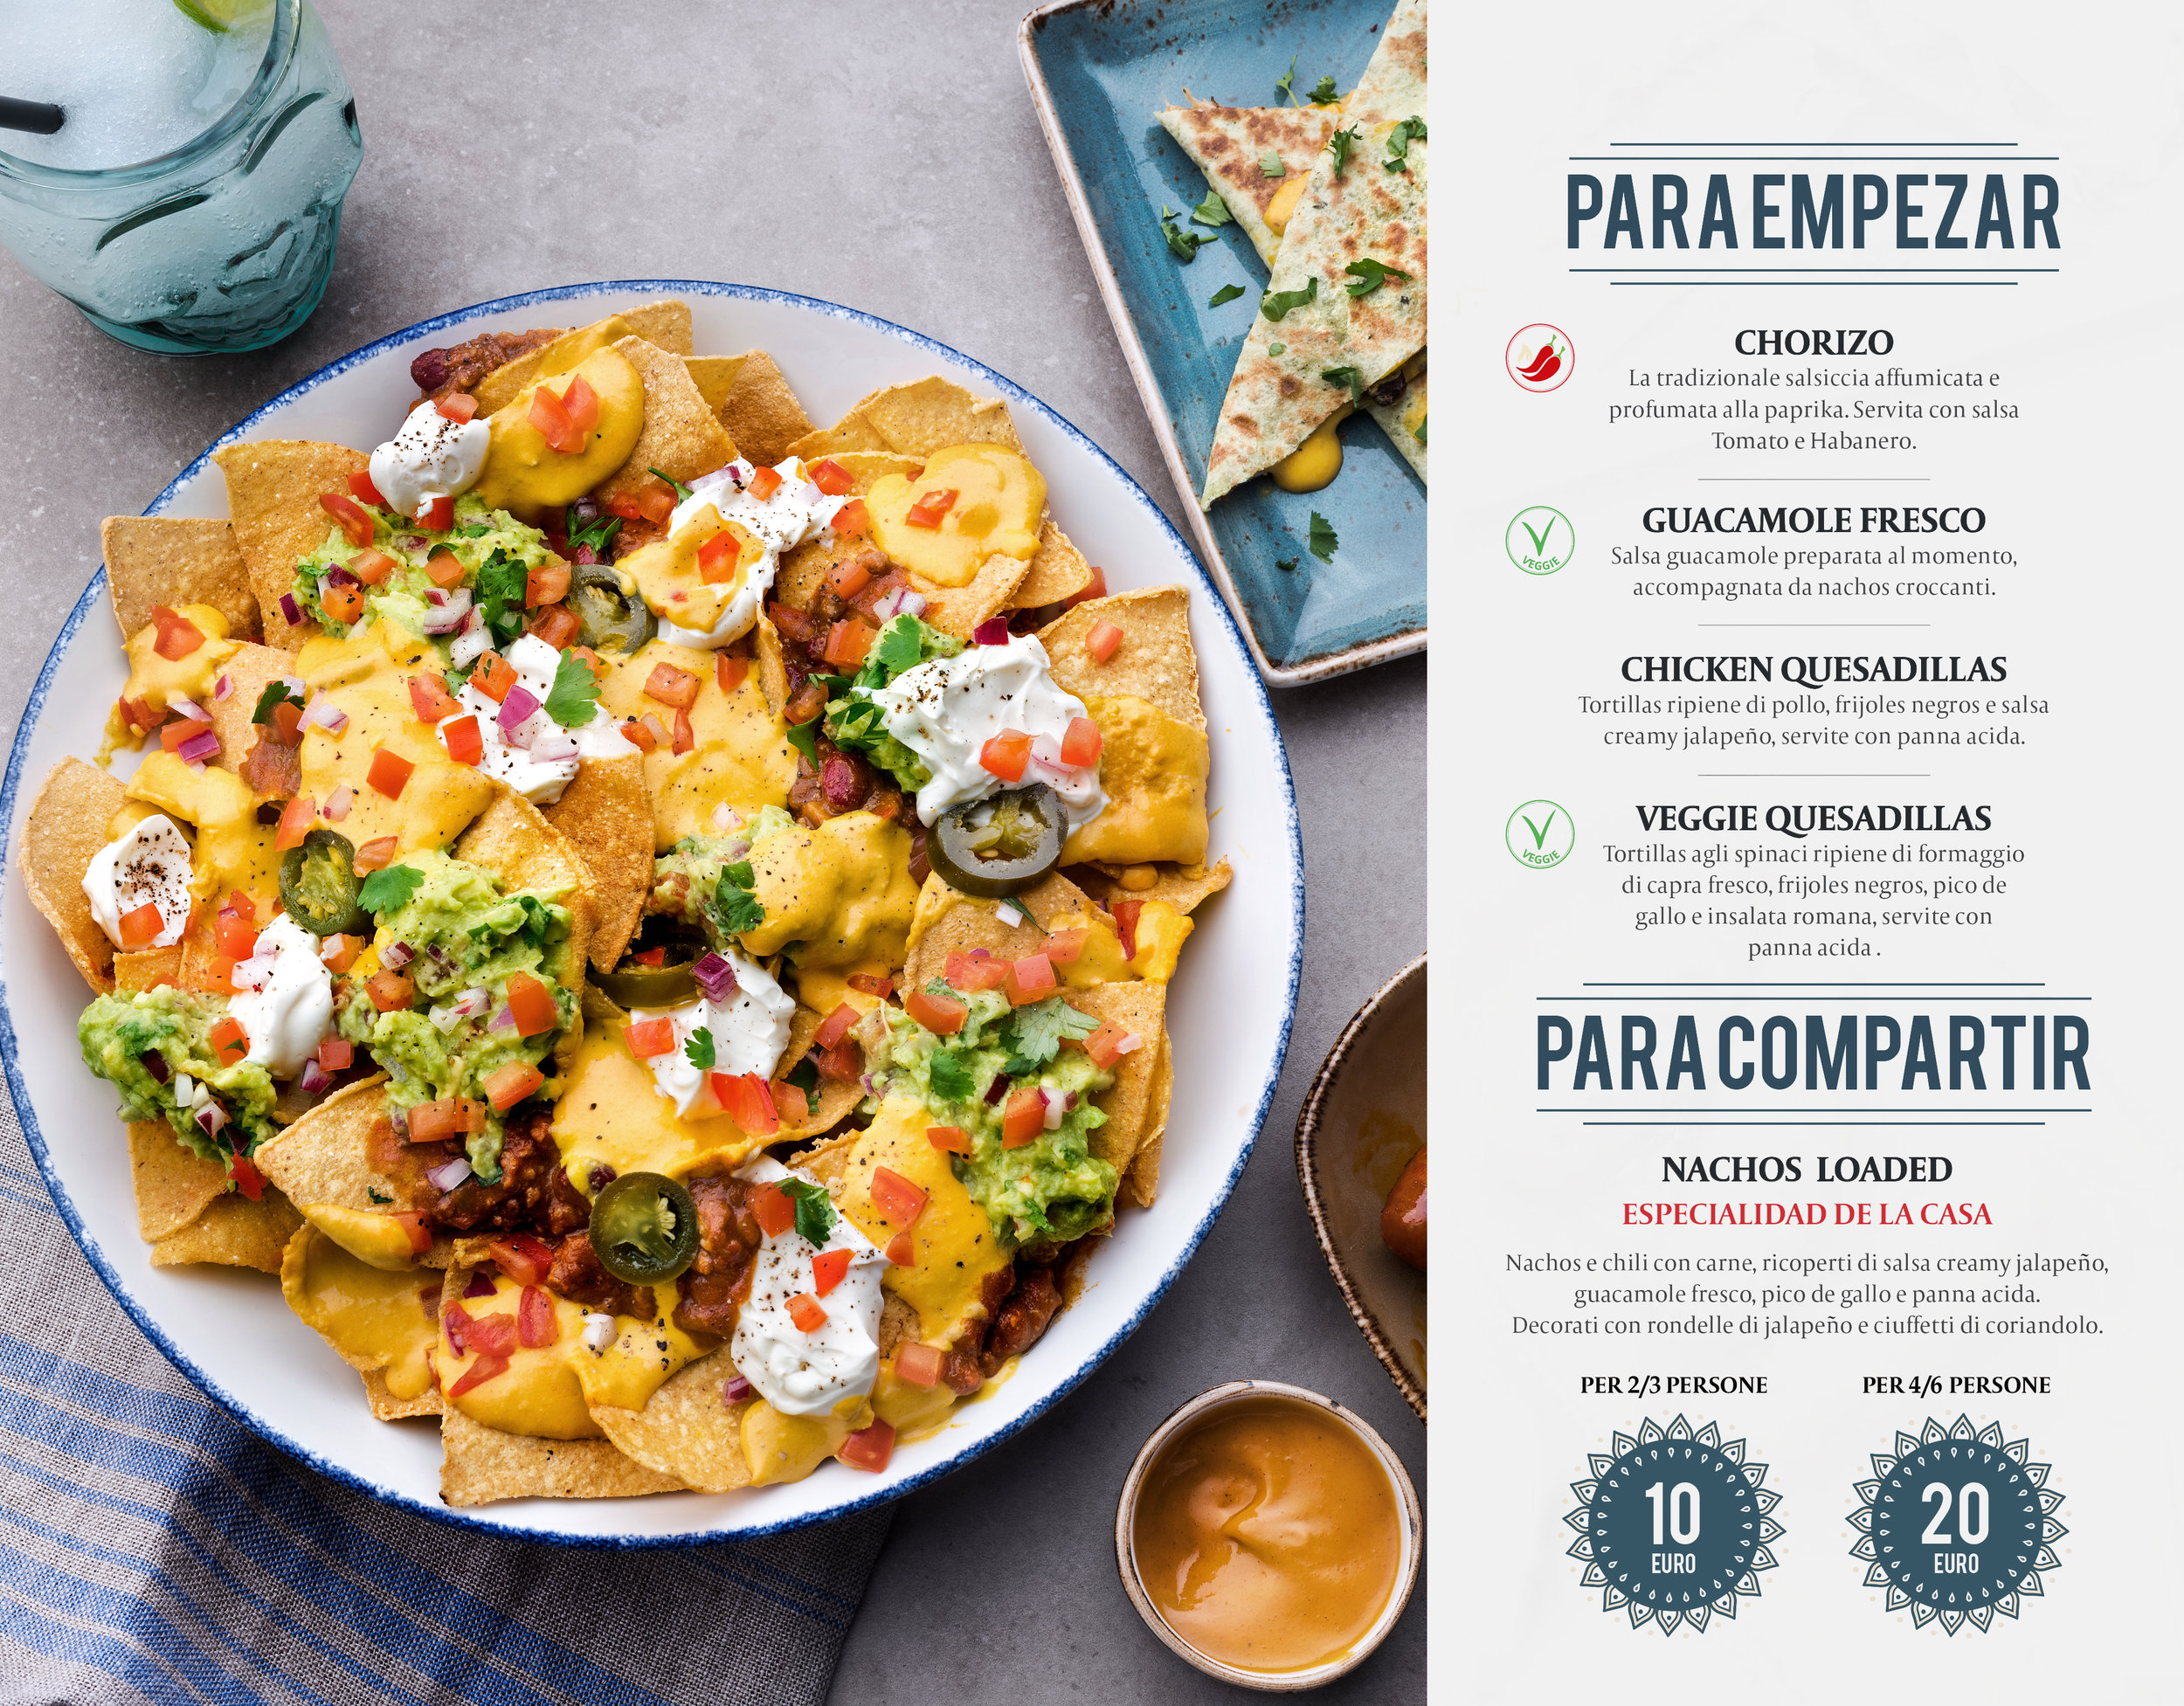 Calavera: Mexican Restaurant Chain in Italy  — Scott Grummett: Food